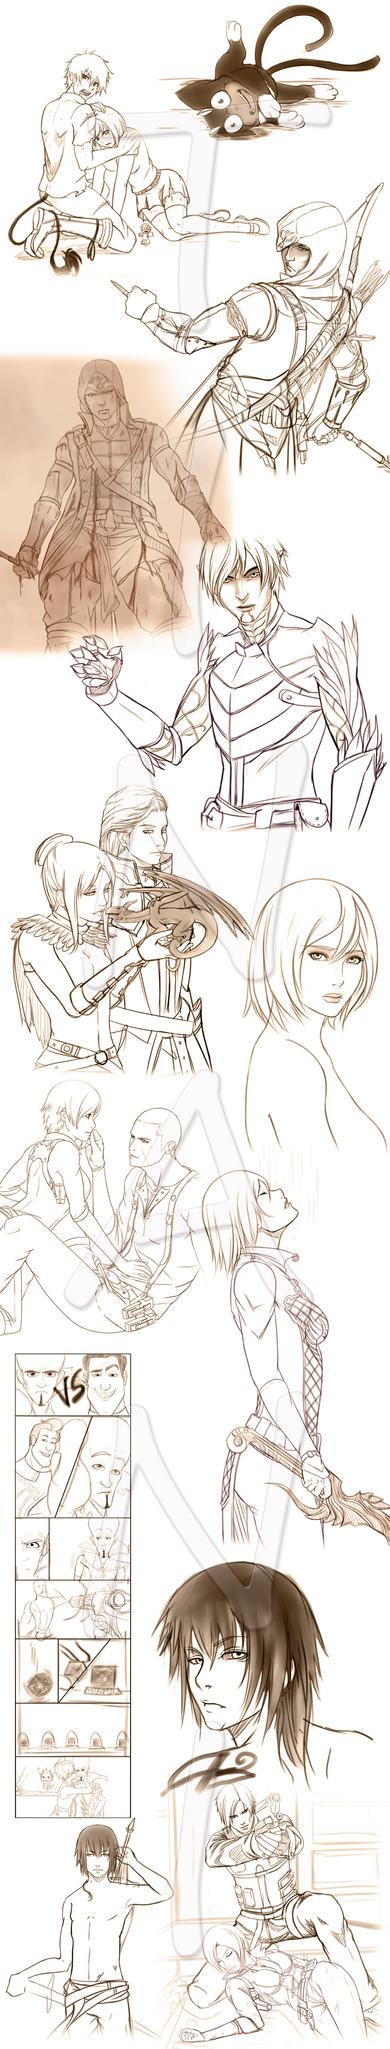 Sketches 1 by Tinani